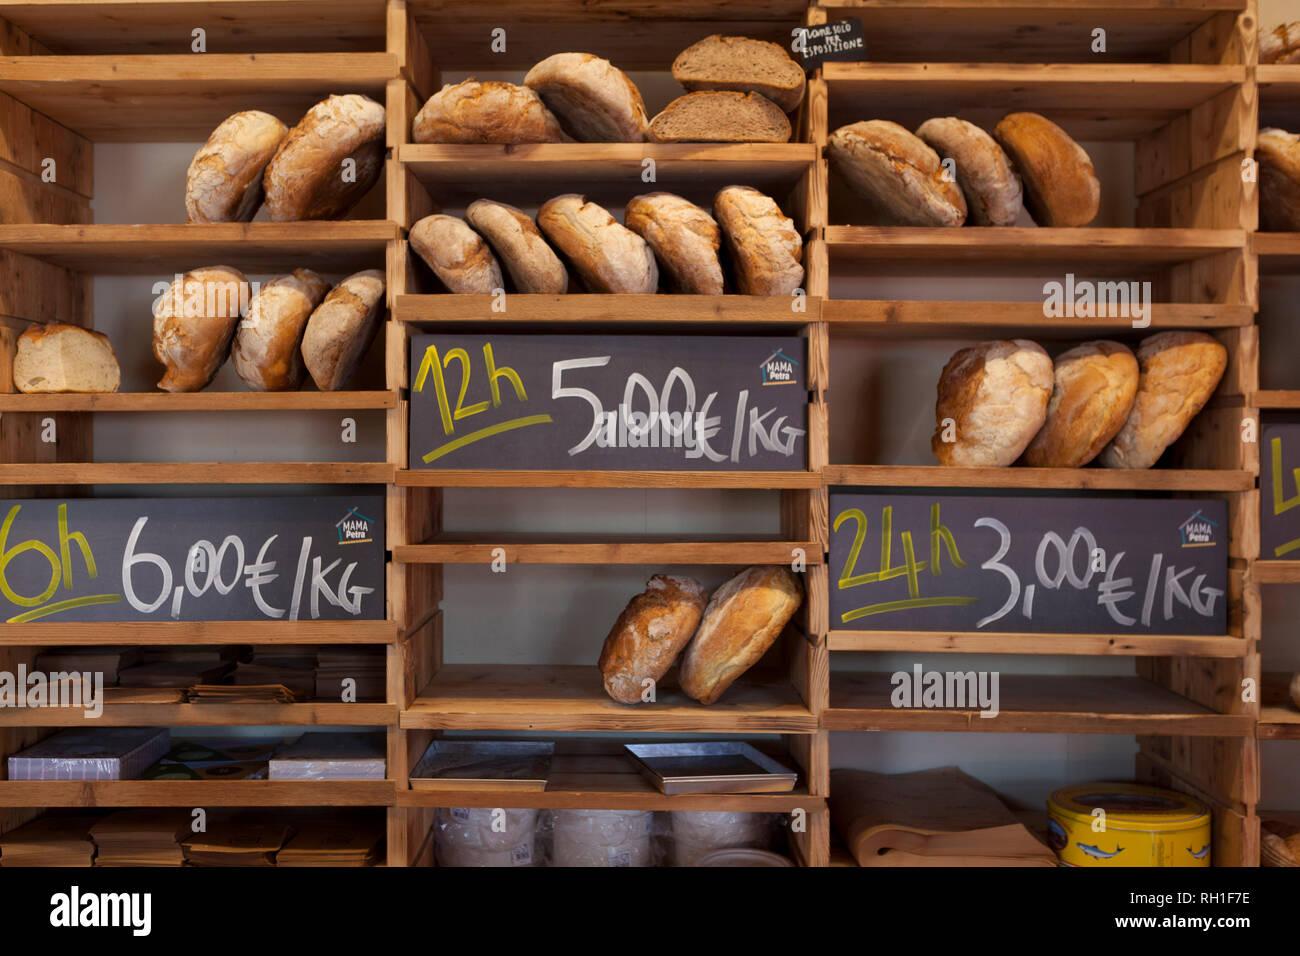 piles of bread, mercato metropolitano, milan, italy - Stock Image